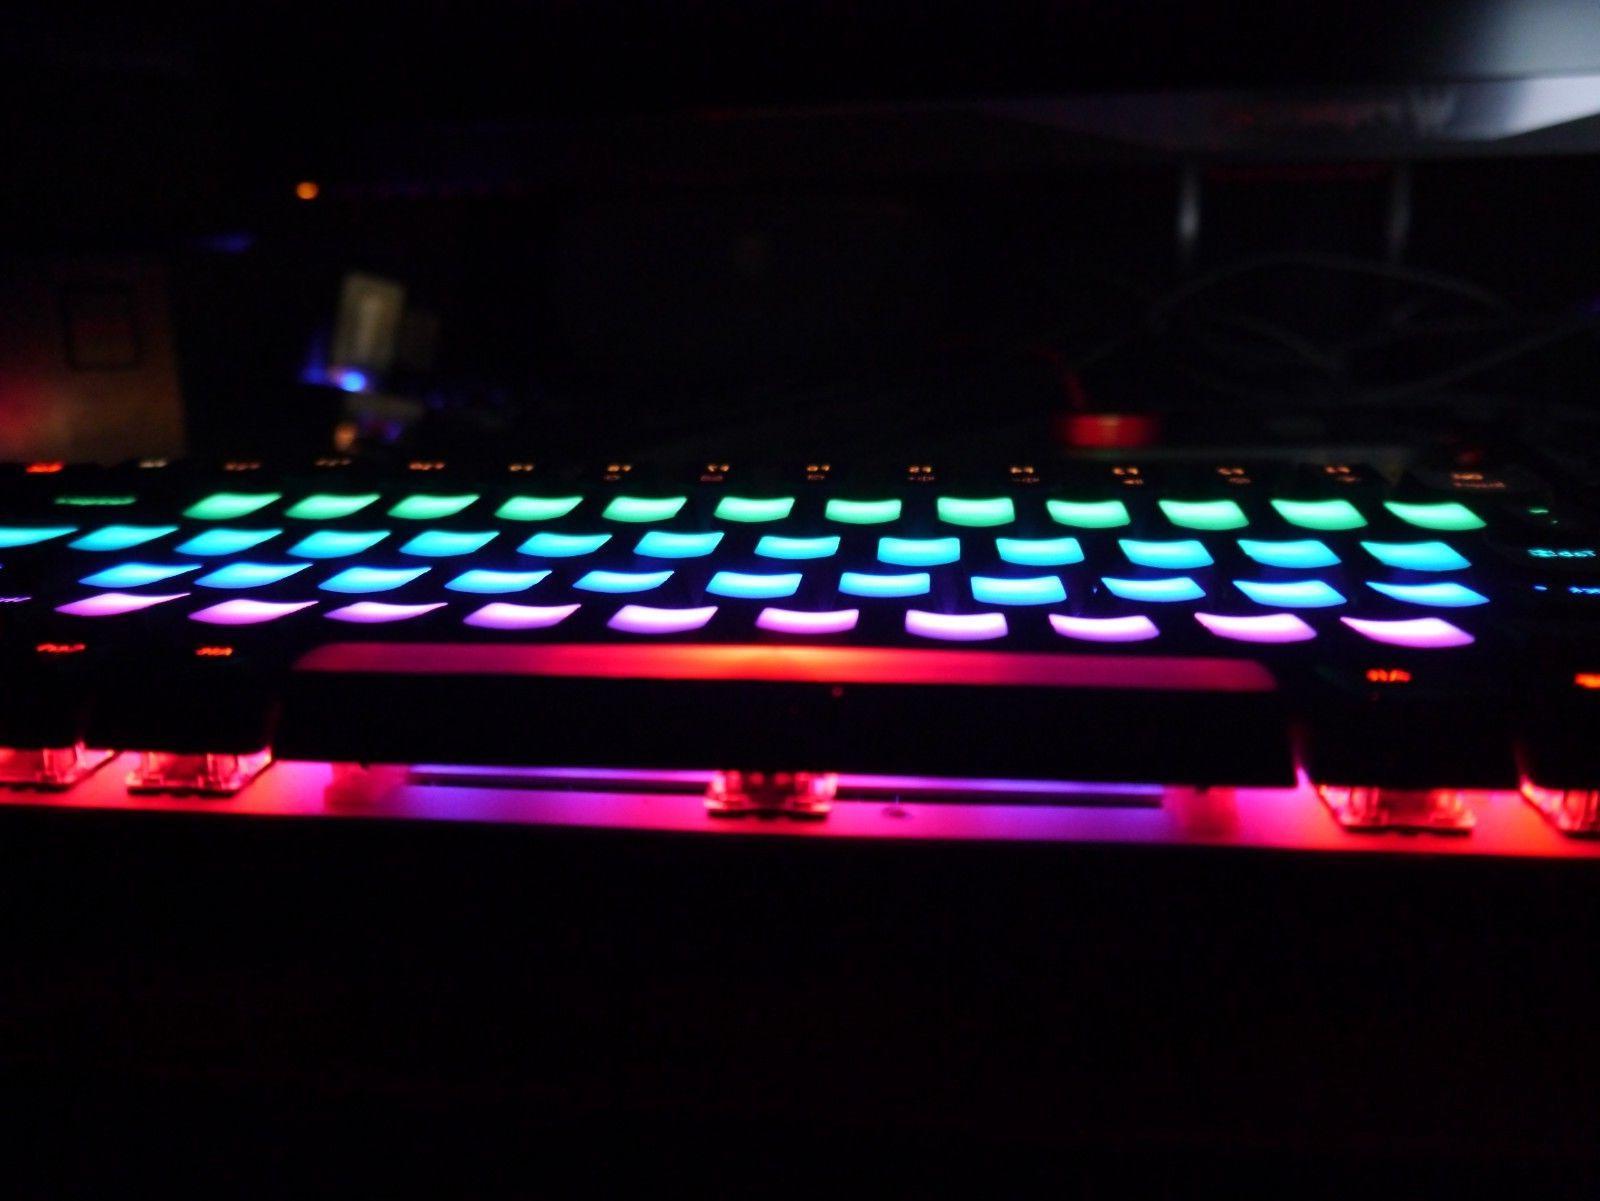 Ajazz RGB Mech Keyboard , Keys, Blue Switches, Decals